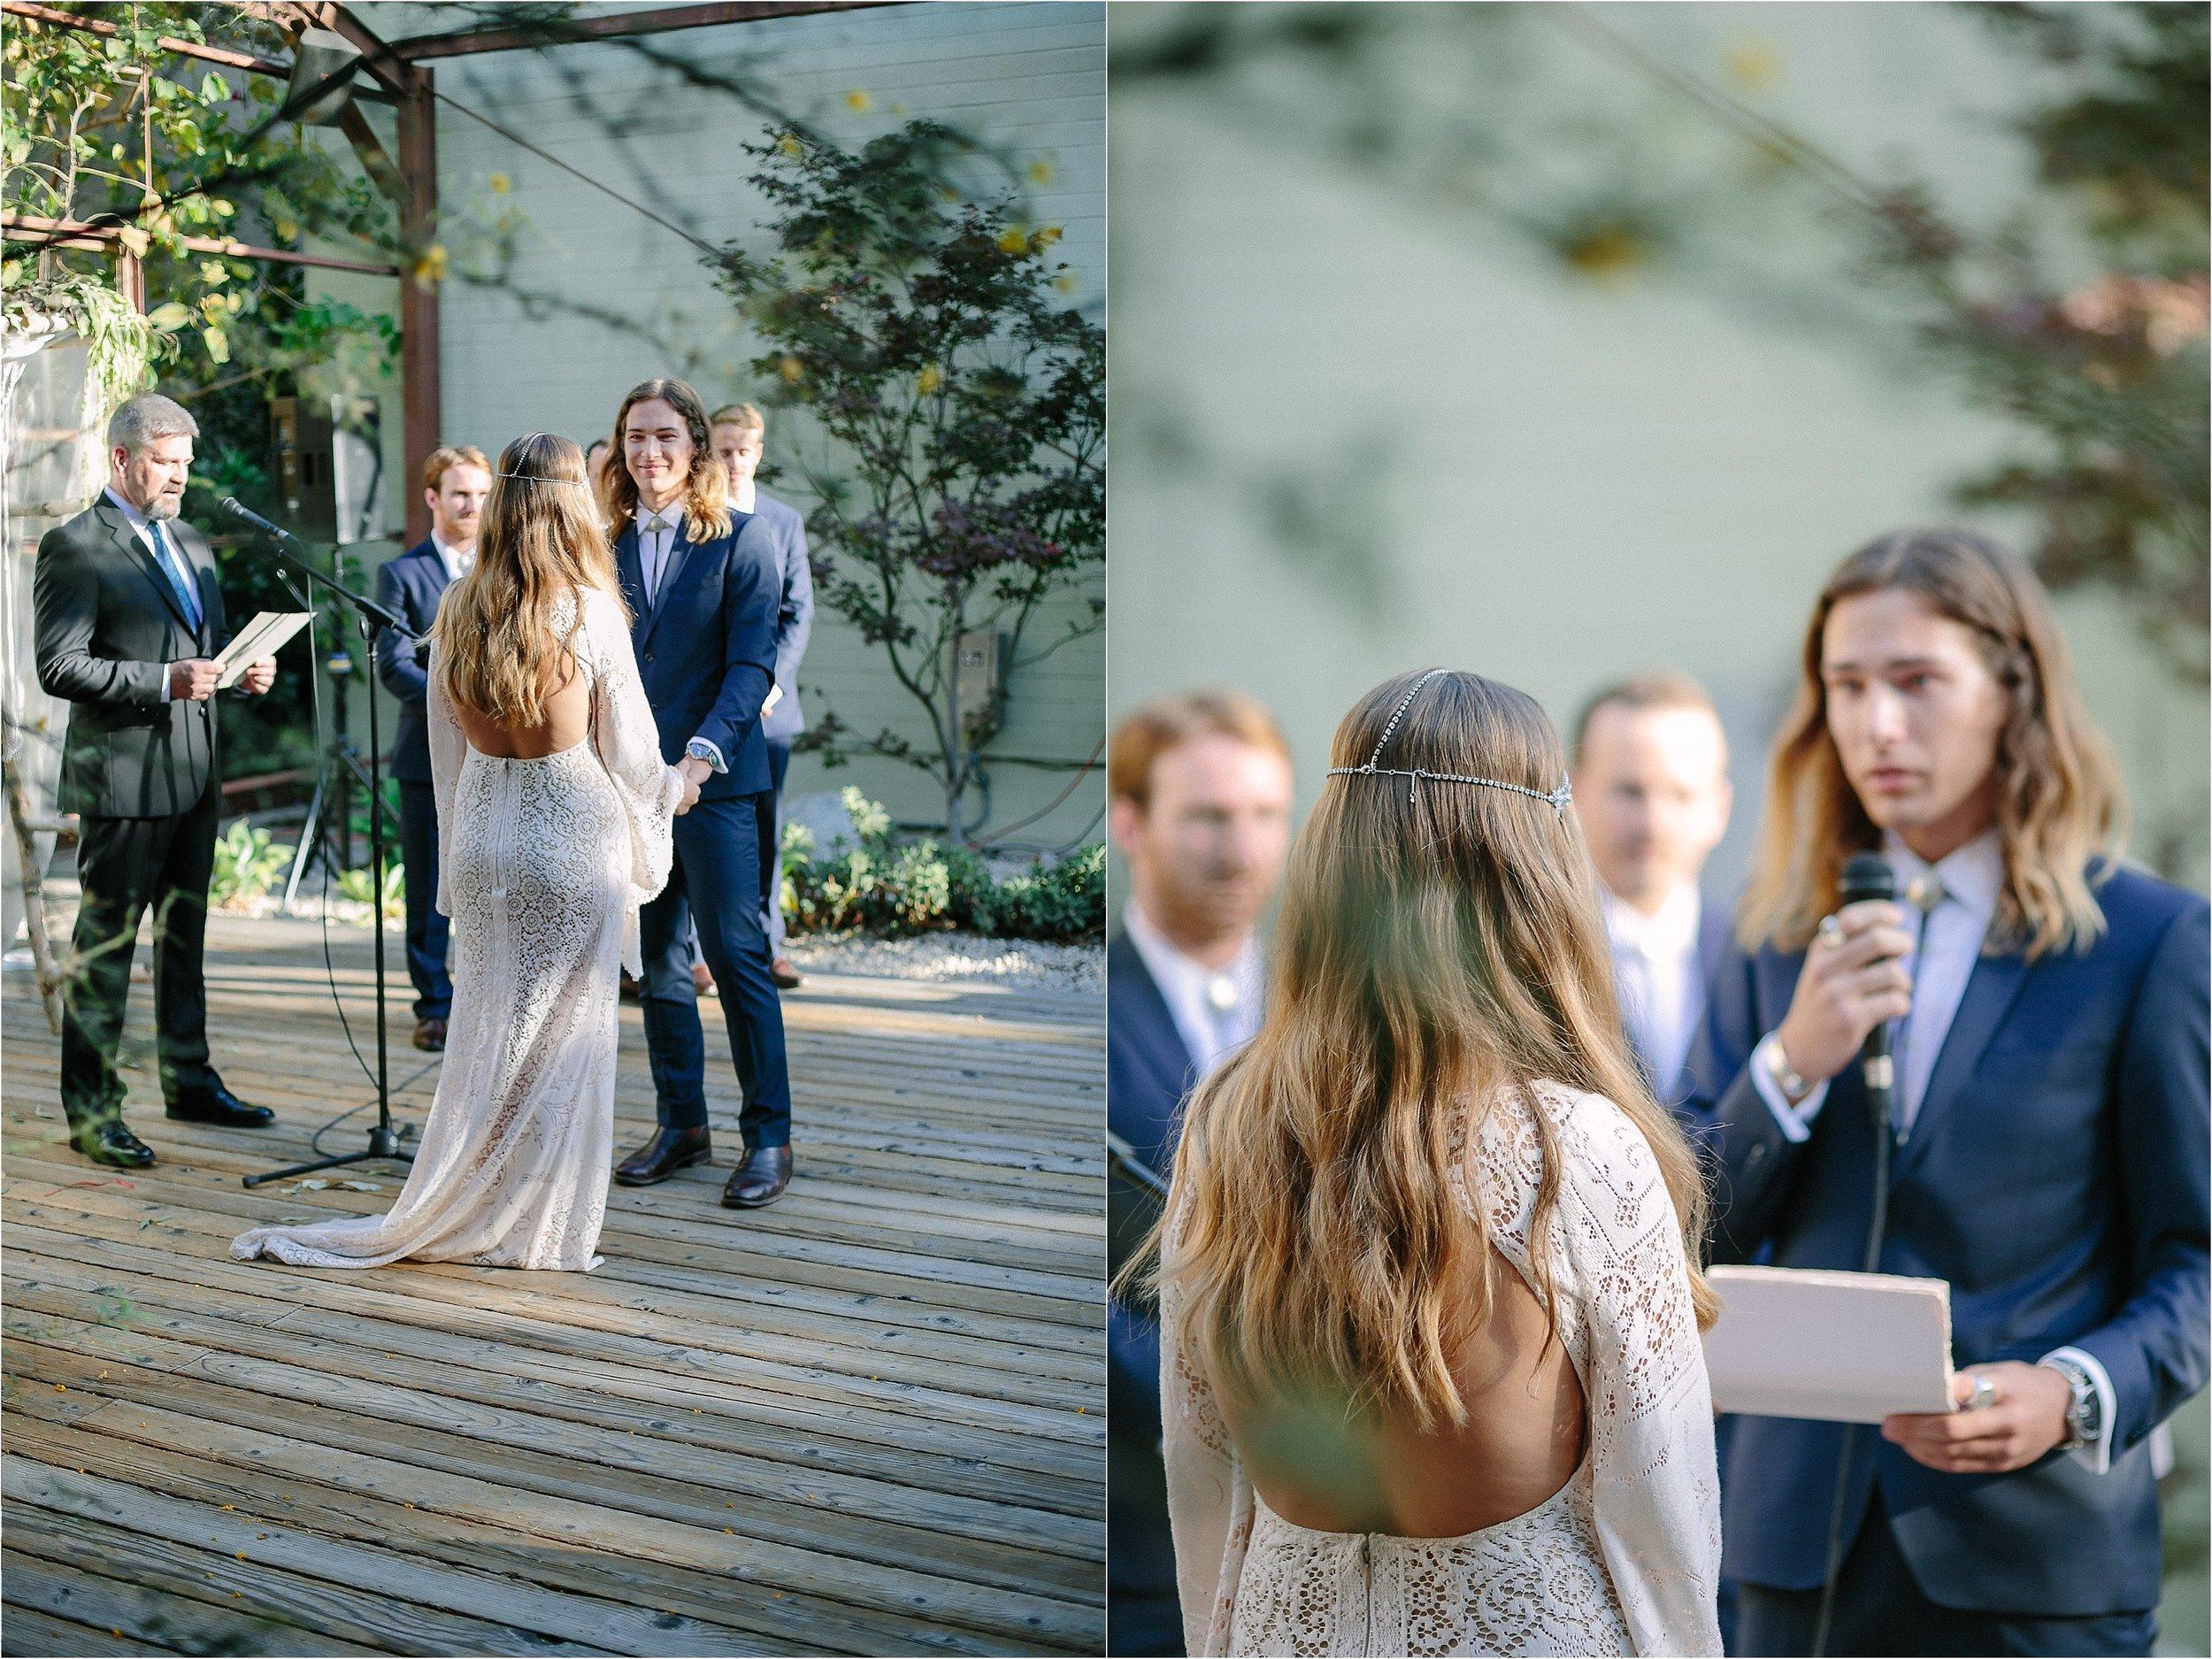 Elysian LA Wedding Ceremony Photo